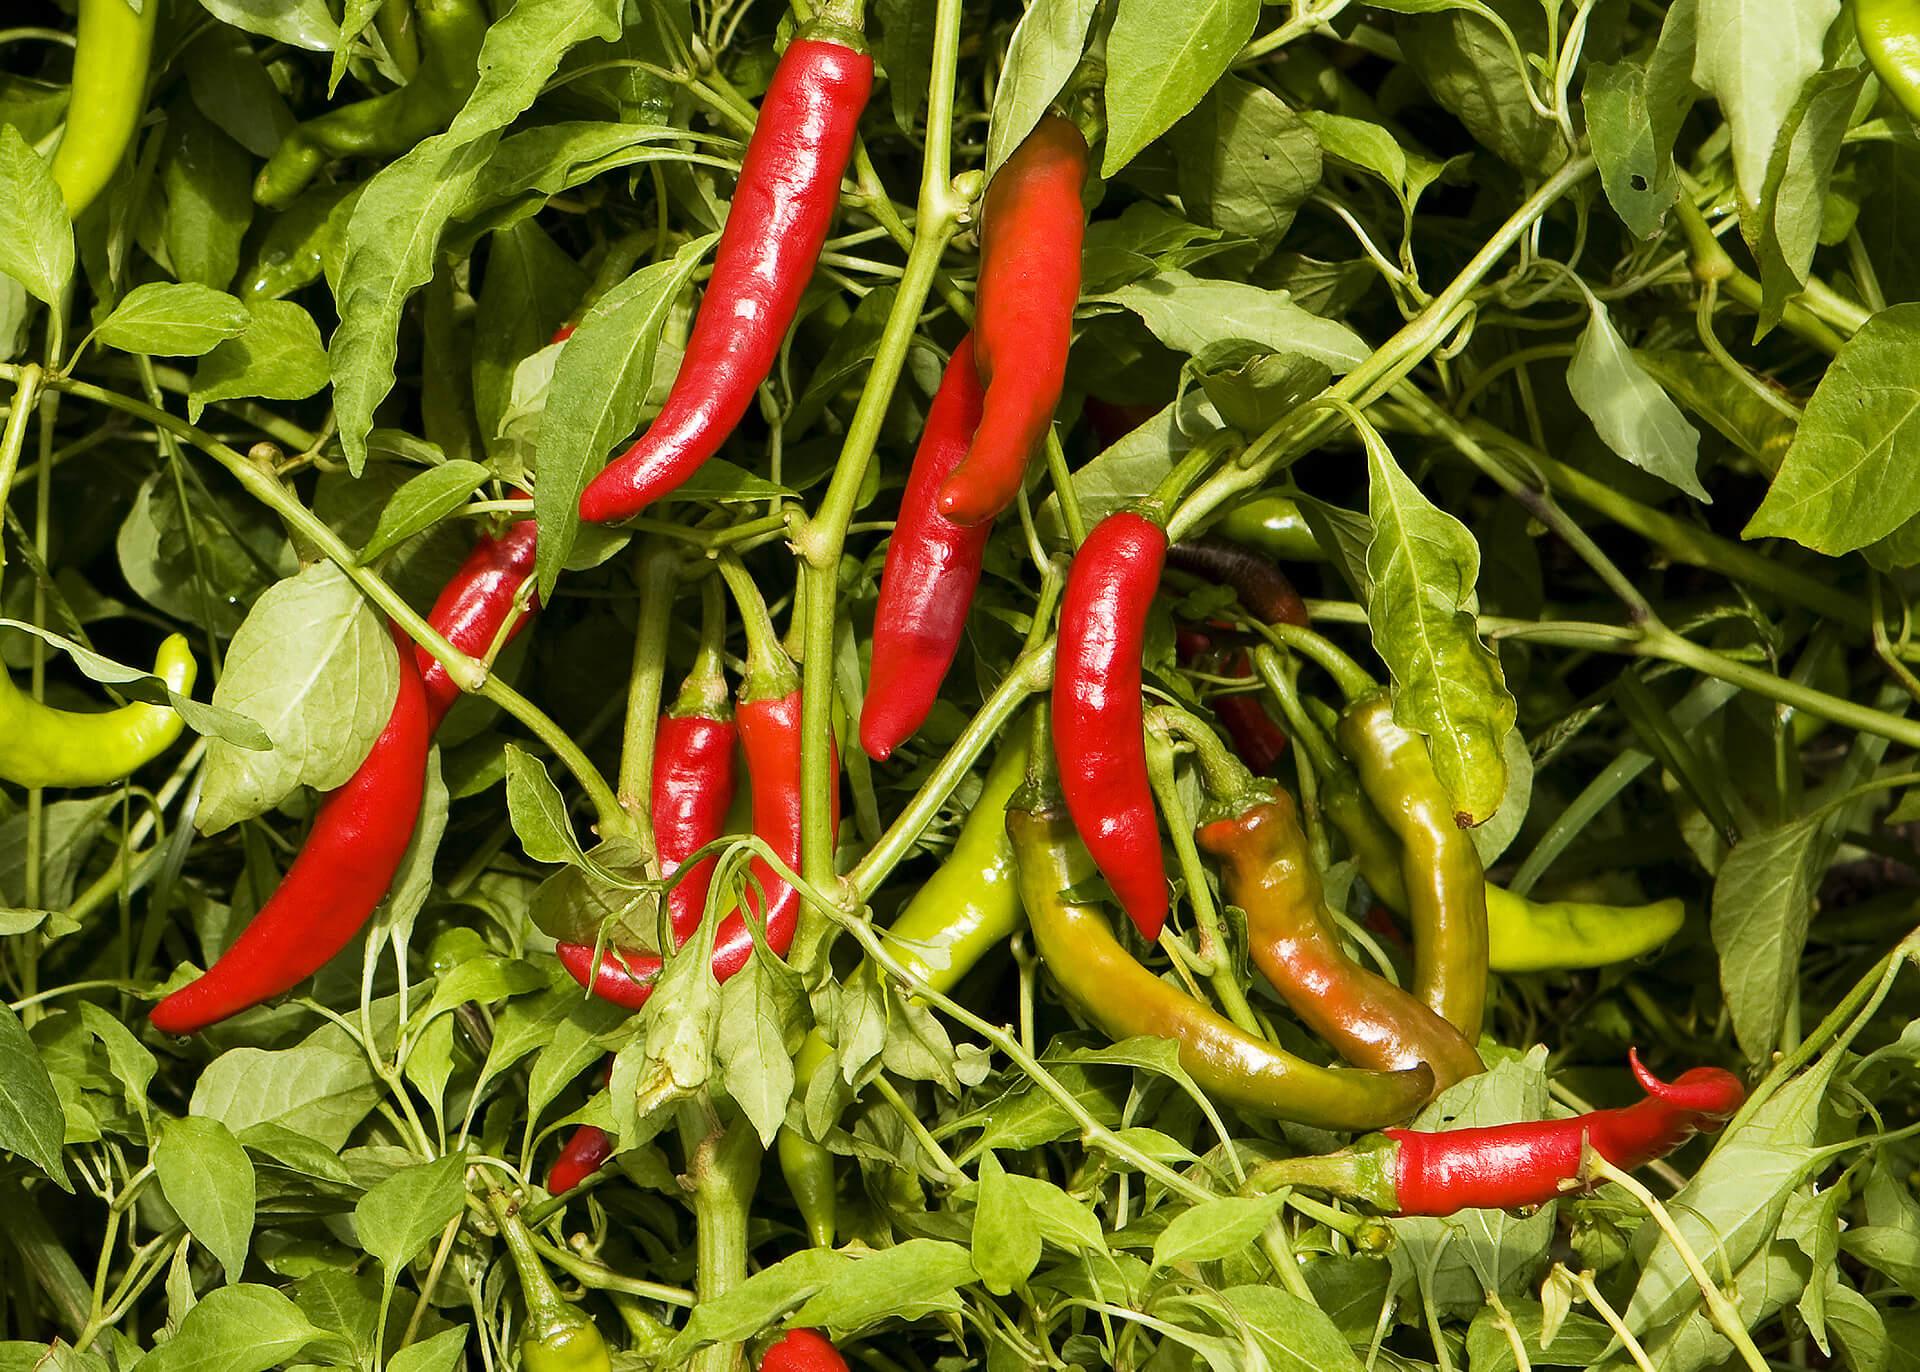 Thai Sweet Chili Sauce Produktion